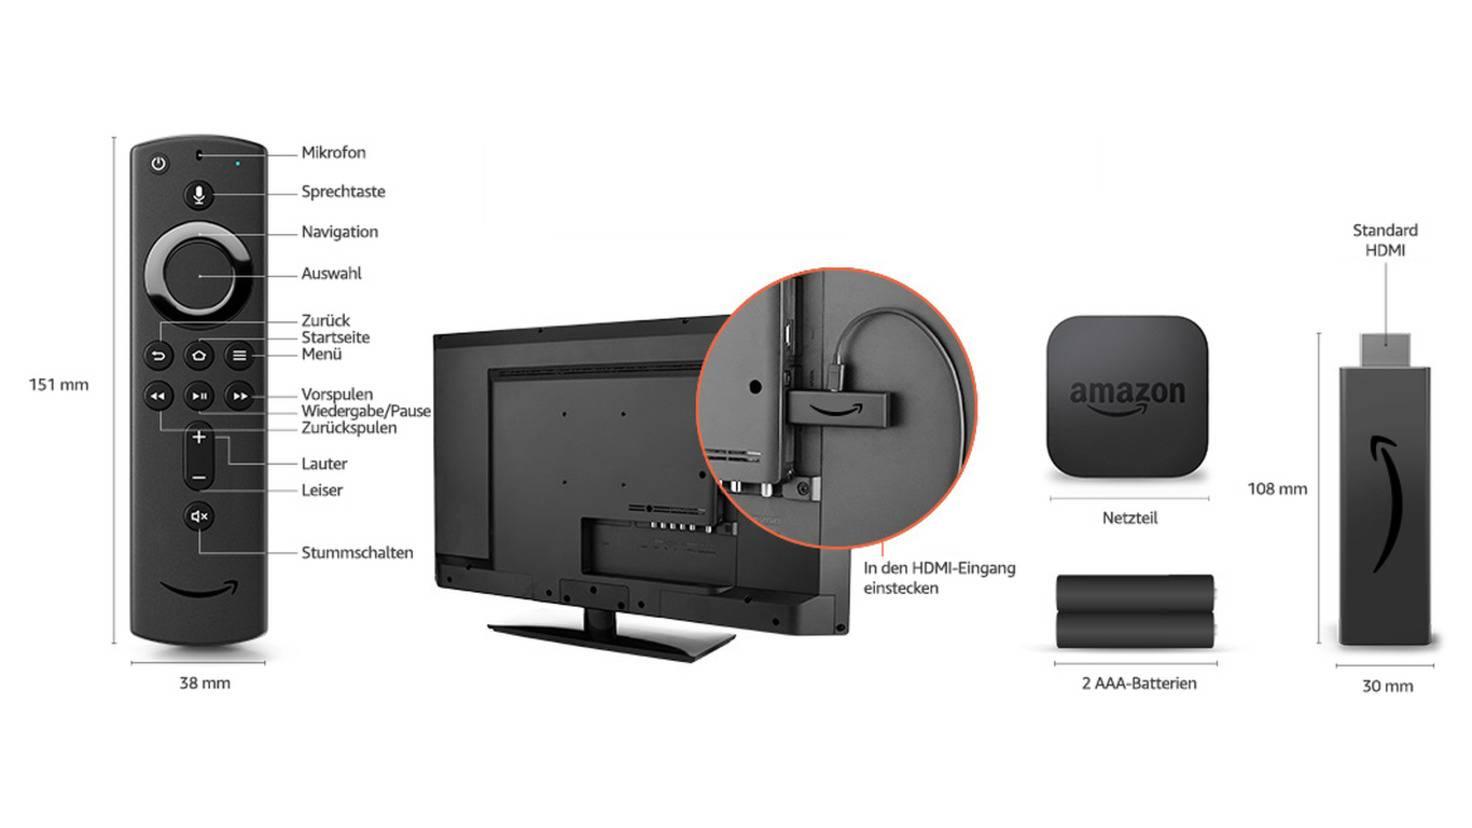 amazon-fire-tv-stick-4k-lieferumfang